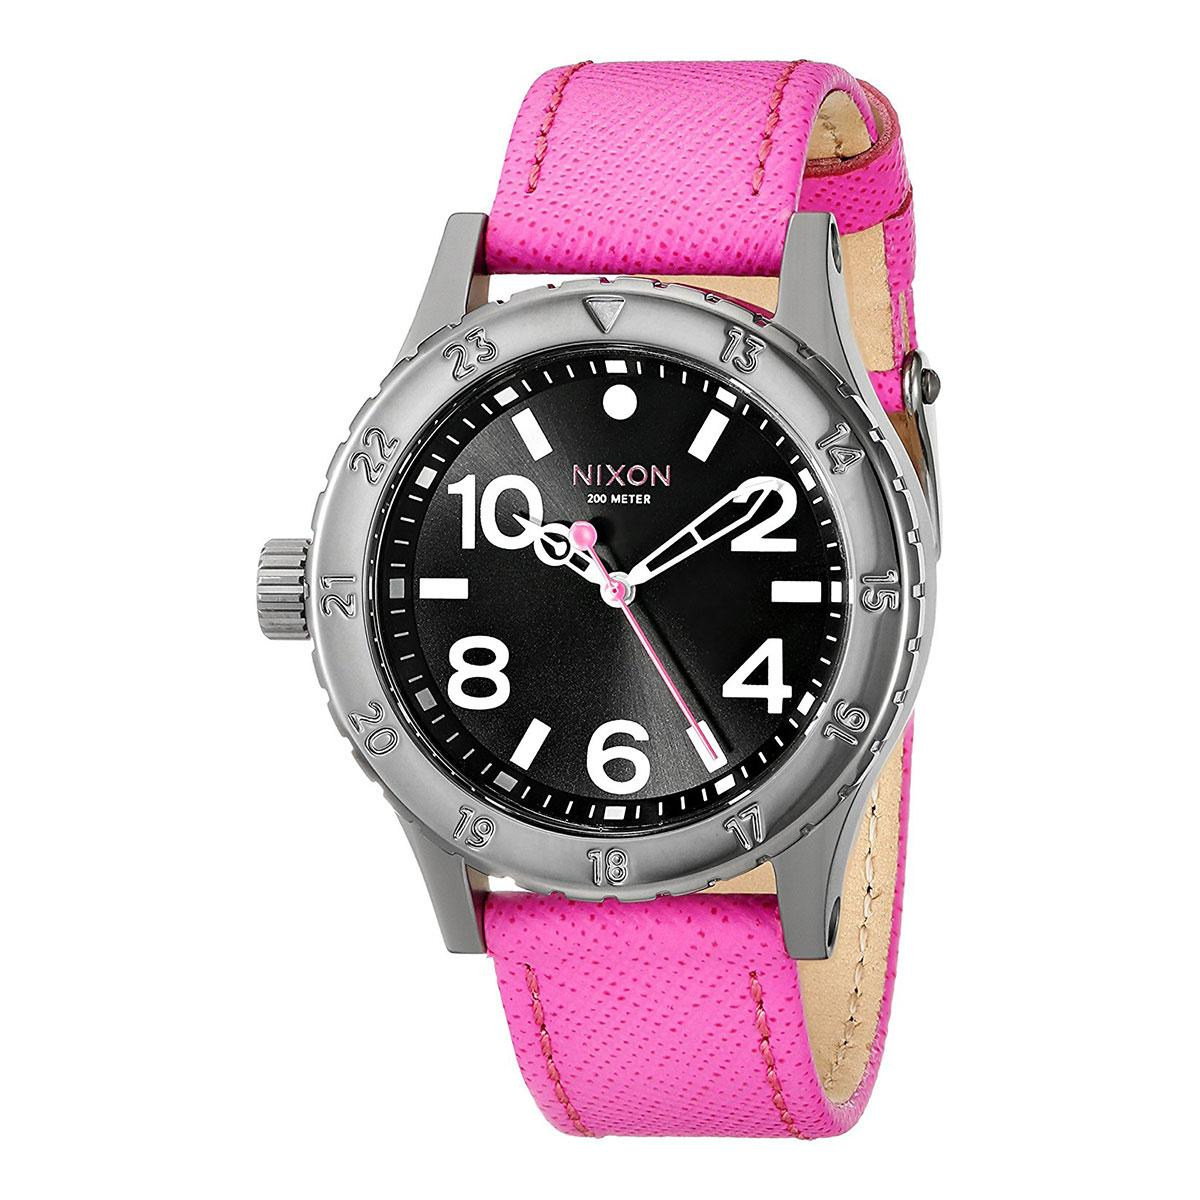 Casio Baby G For Running Series Step Tracker Pastel Pink Resin Strap Bga 230 7b2 Original Nixon 38 20 Stainless Steel Case Leather Ladies A4672049